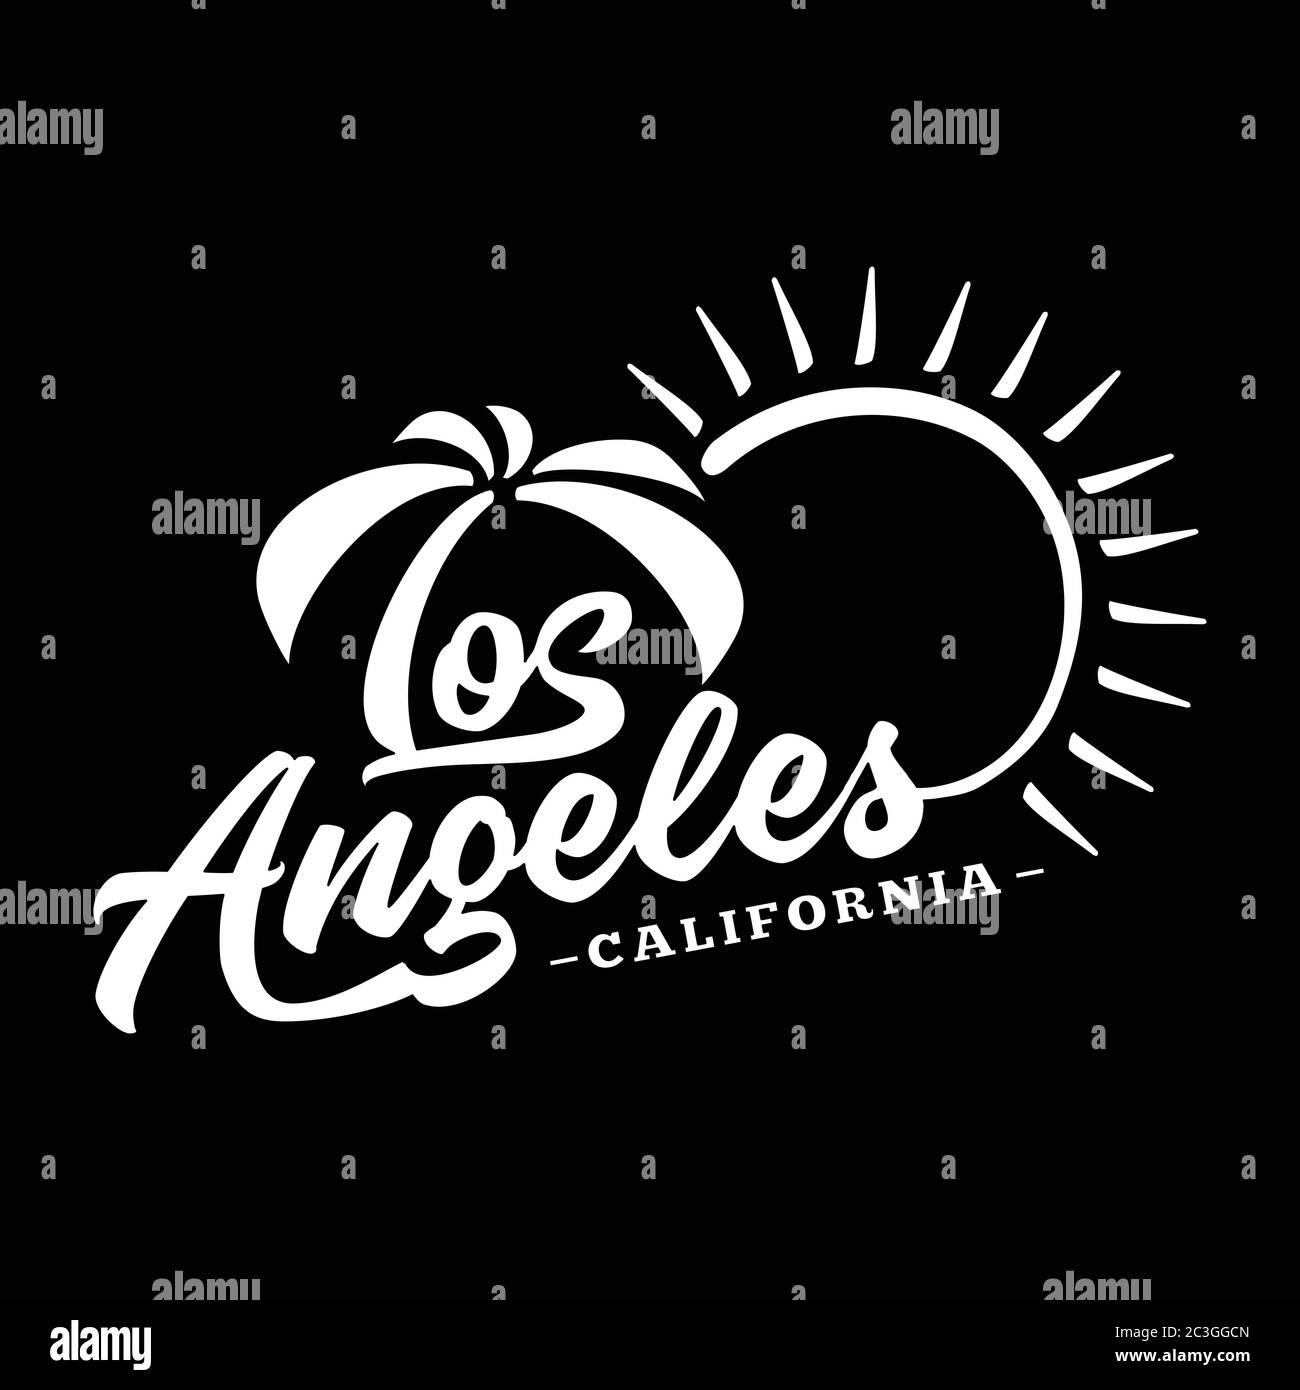 Los Angeles Black And White Lettering Design Decorative Inscription Vintage Vector And Illustration Stock Vector Image Art Alamy,Clash Of Clans Builder Hall 4 Base Design